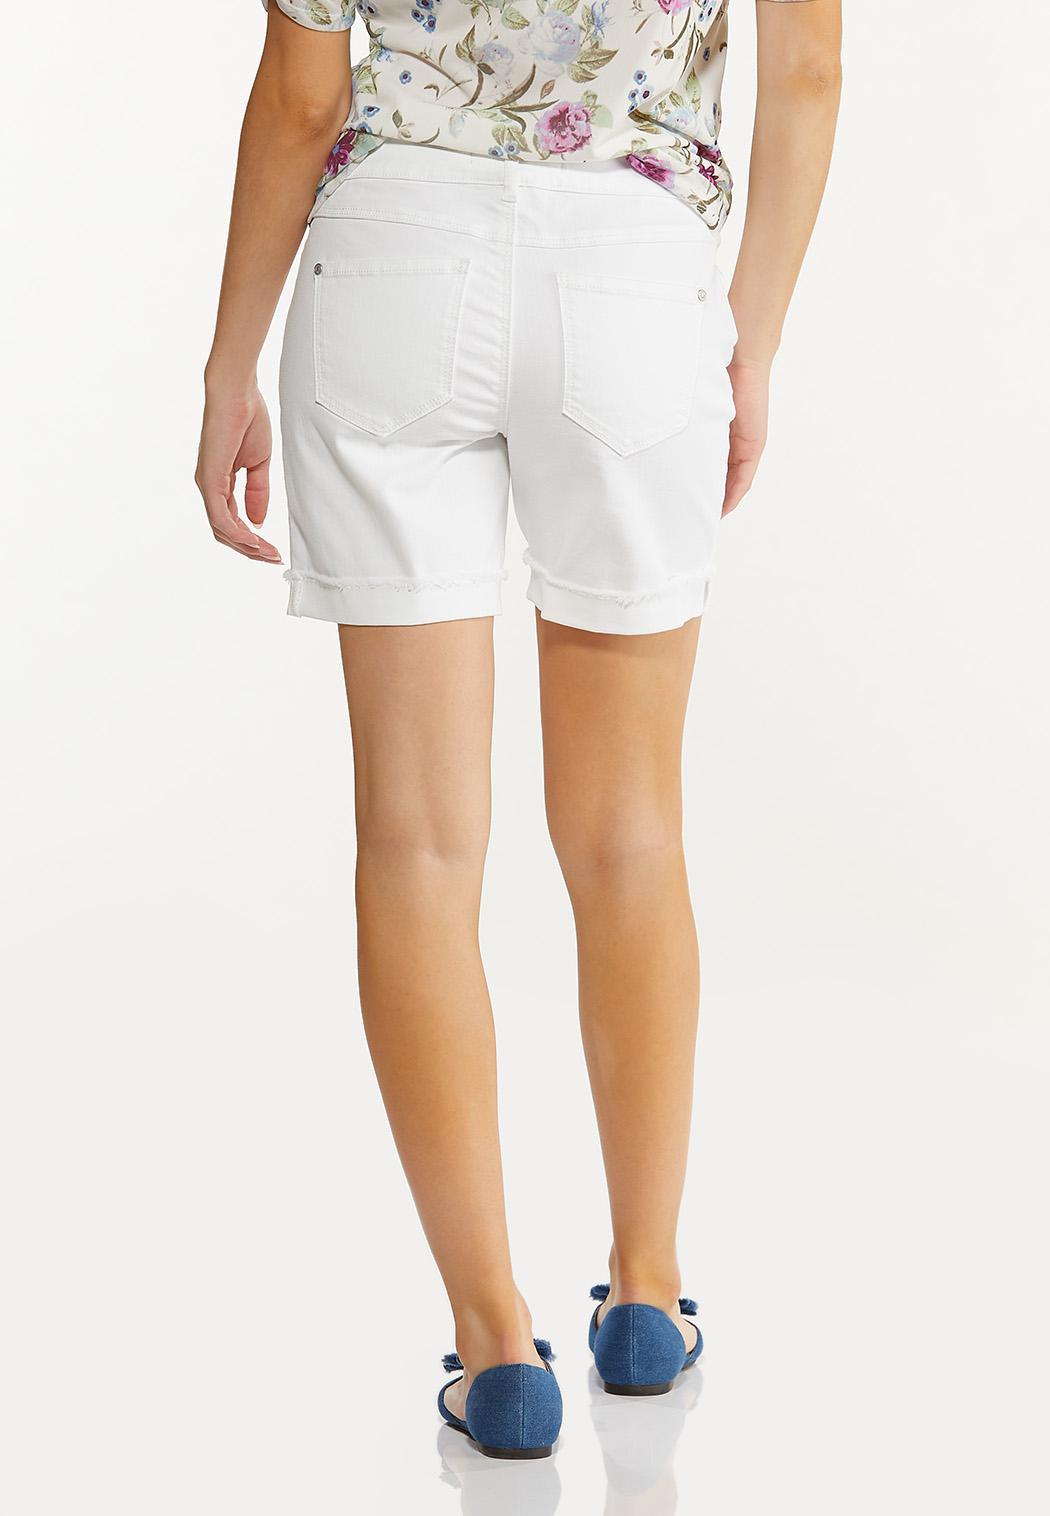 White Distressed Denim Shorts (Item #44551868)